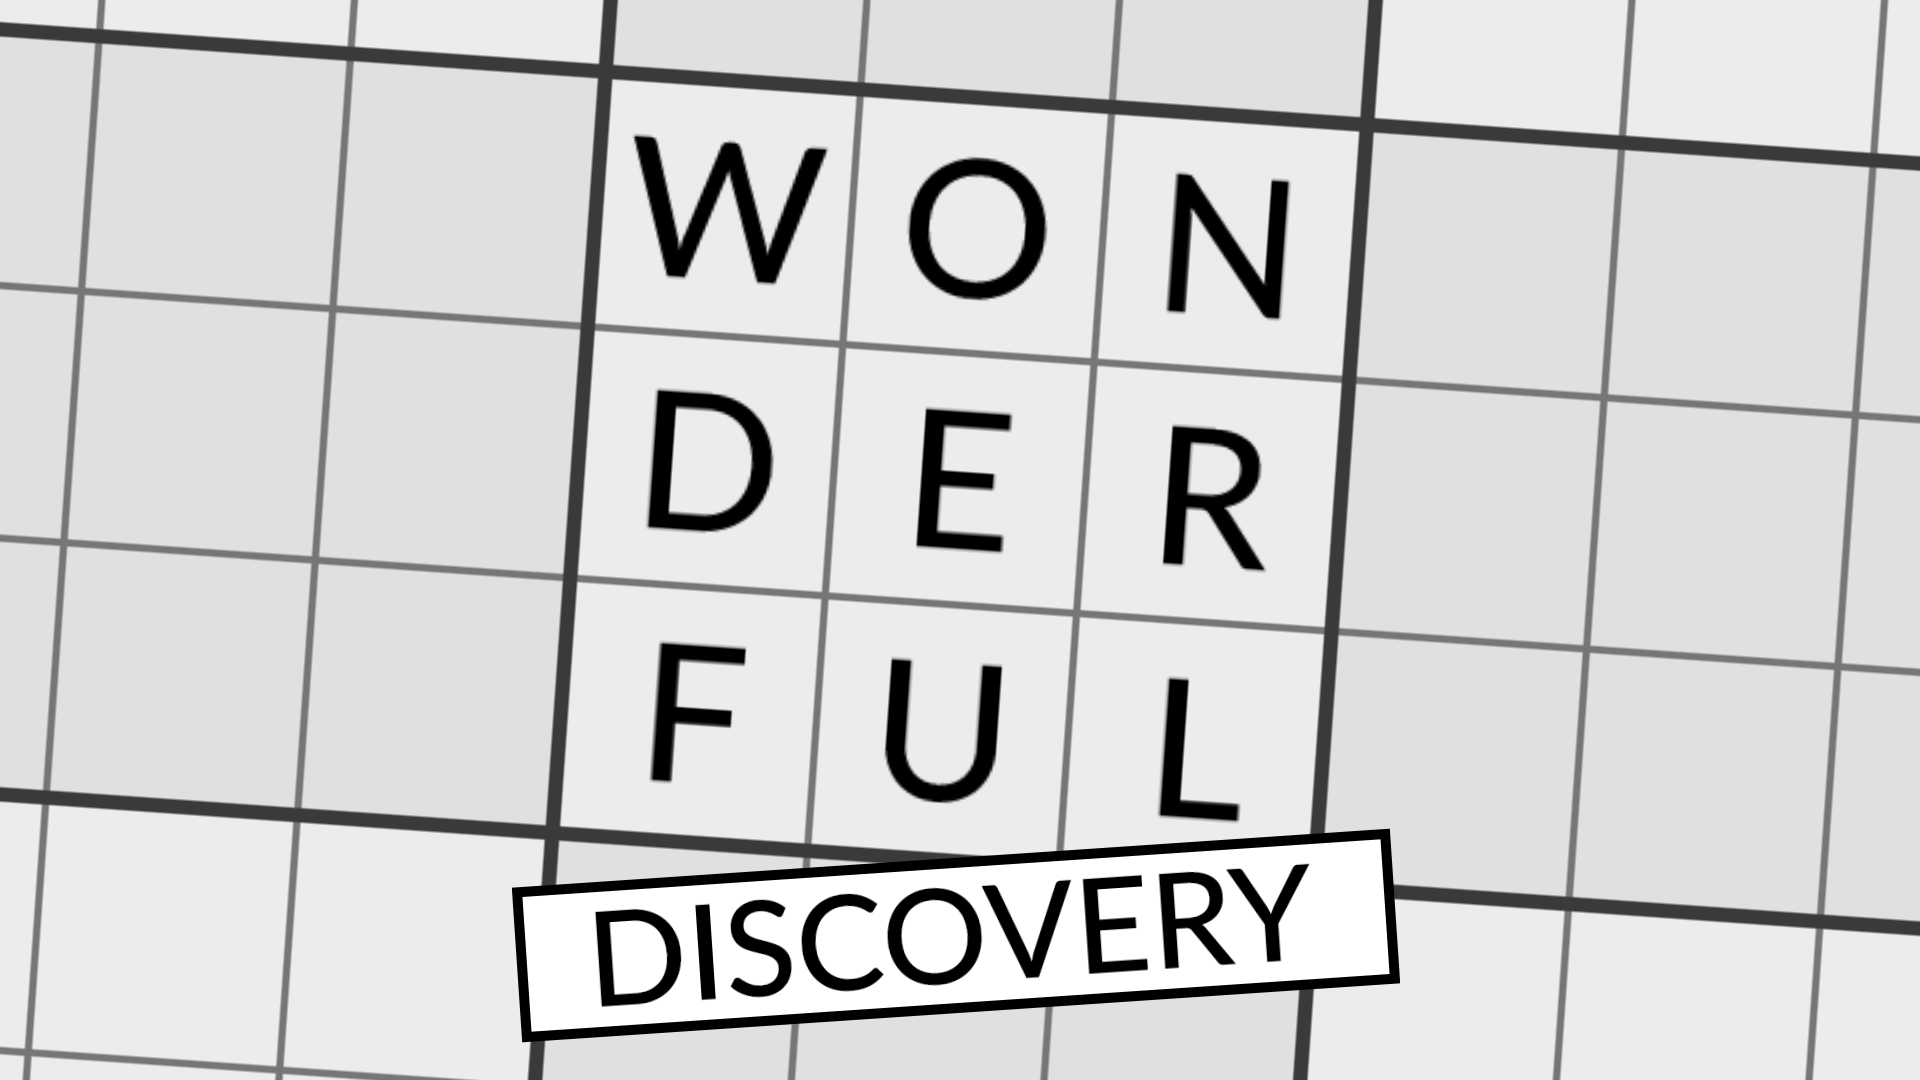 A Wonderful Discovery